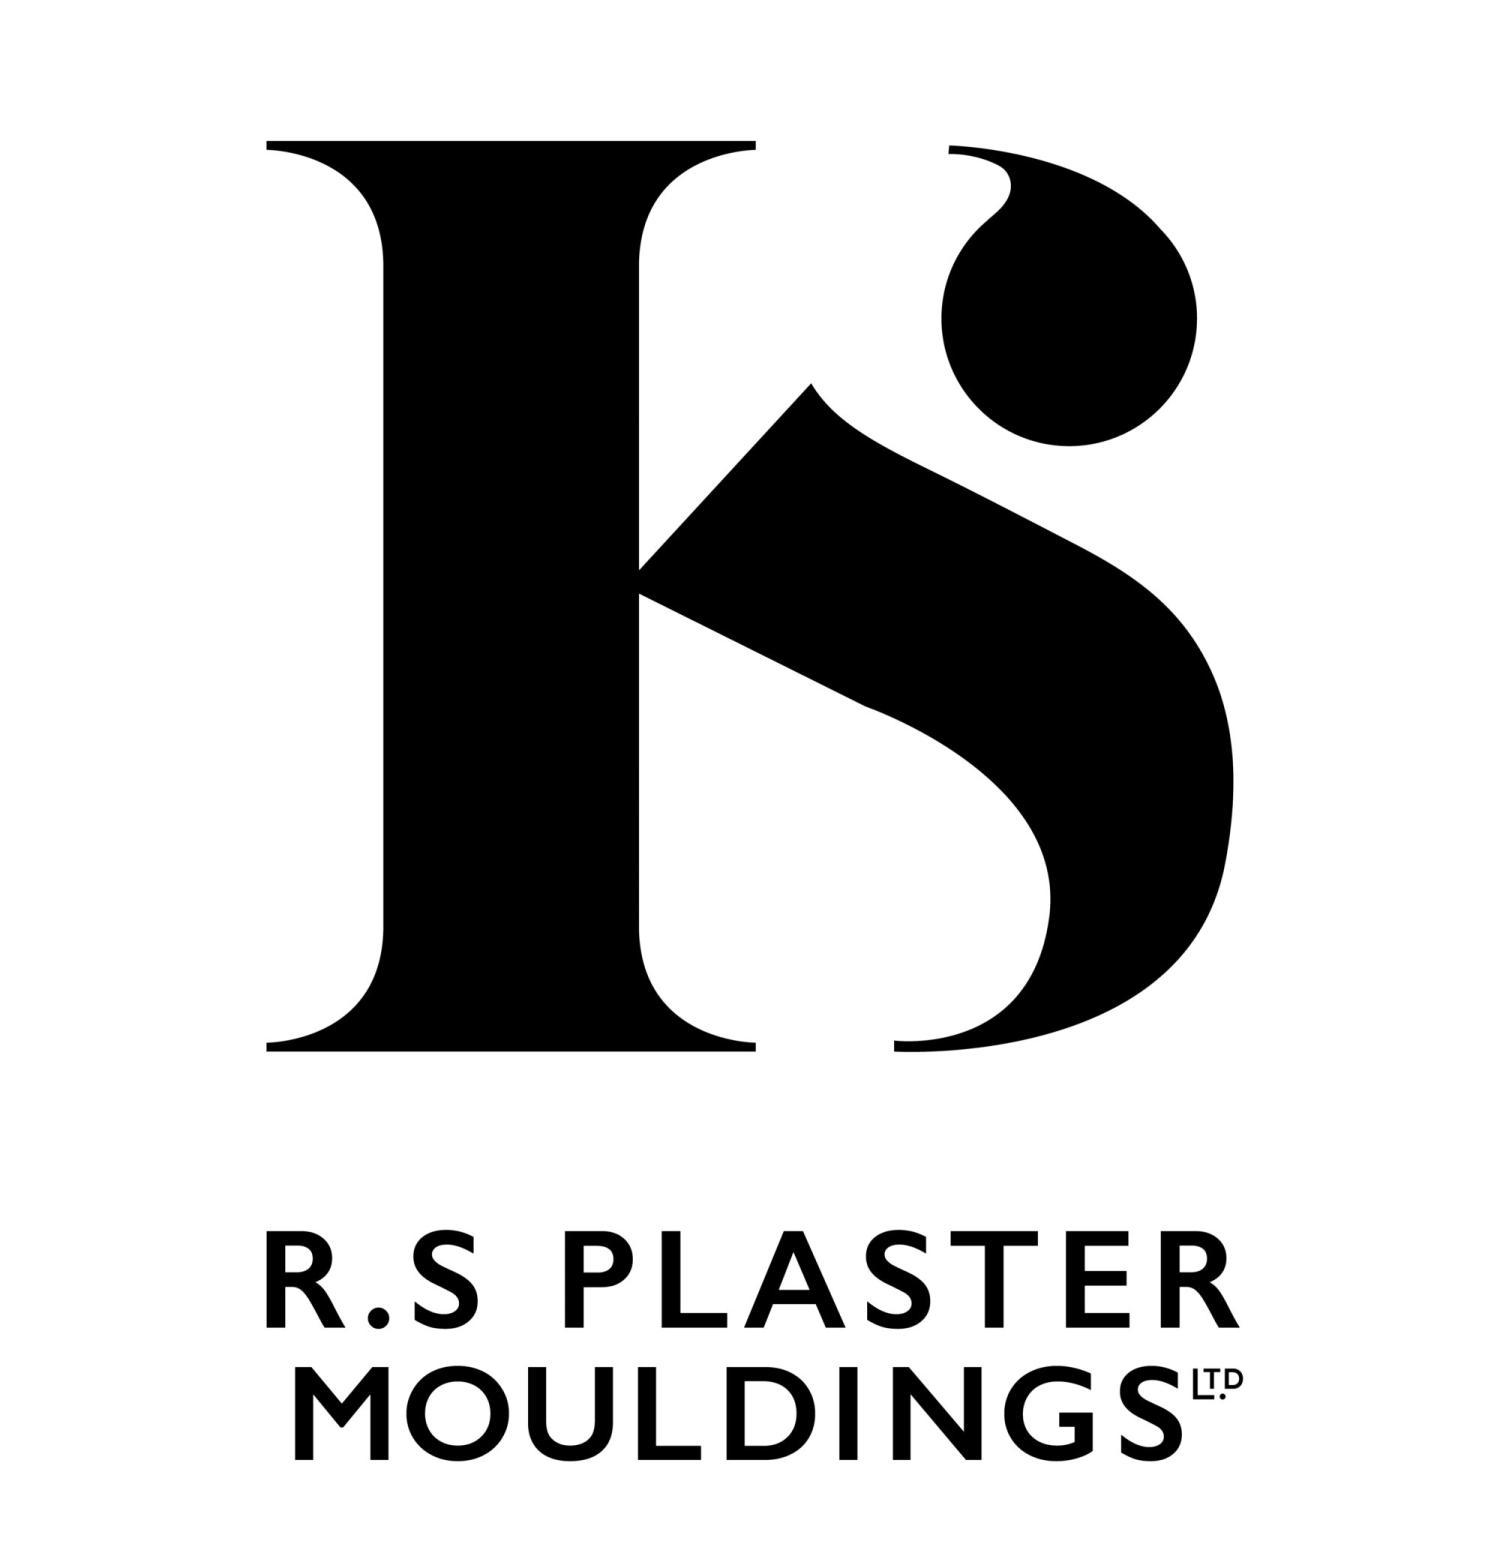 RS Plaster Mouldings Ltd